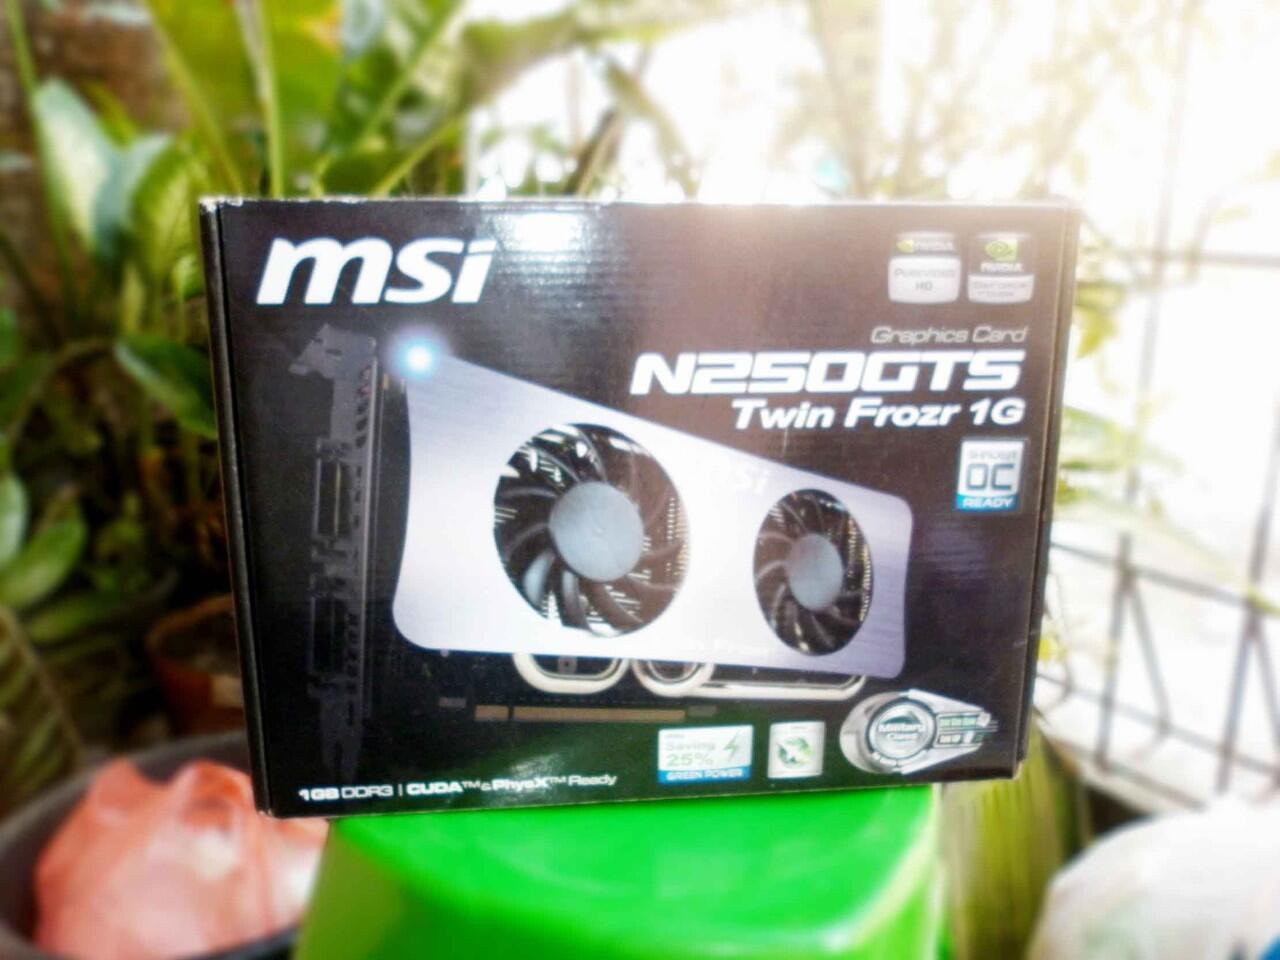 ░▒▓█ VGA MSI GTS 250 512 MB 256 BIT Twin Frozr OC Edition (SOLO) █▓▒░